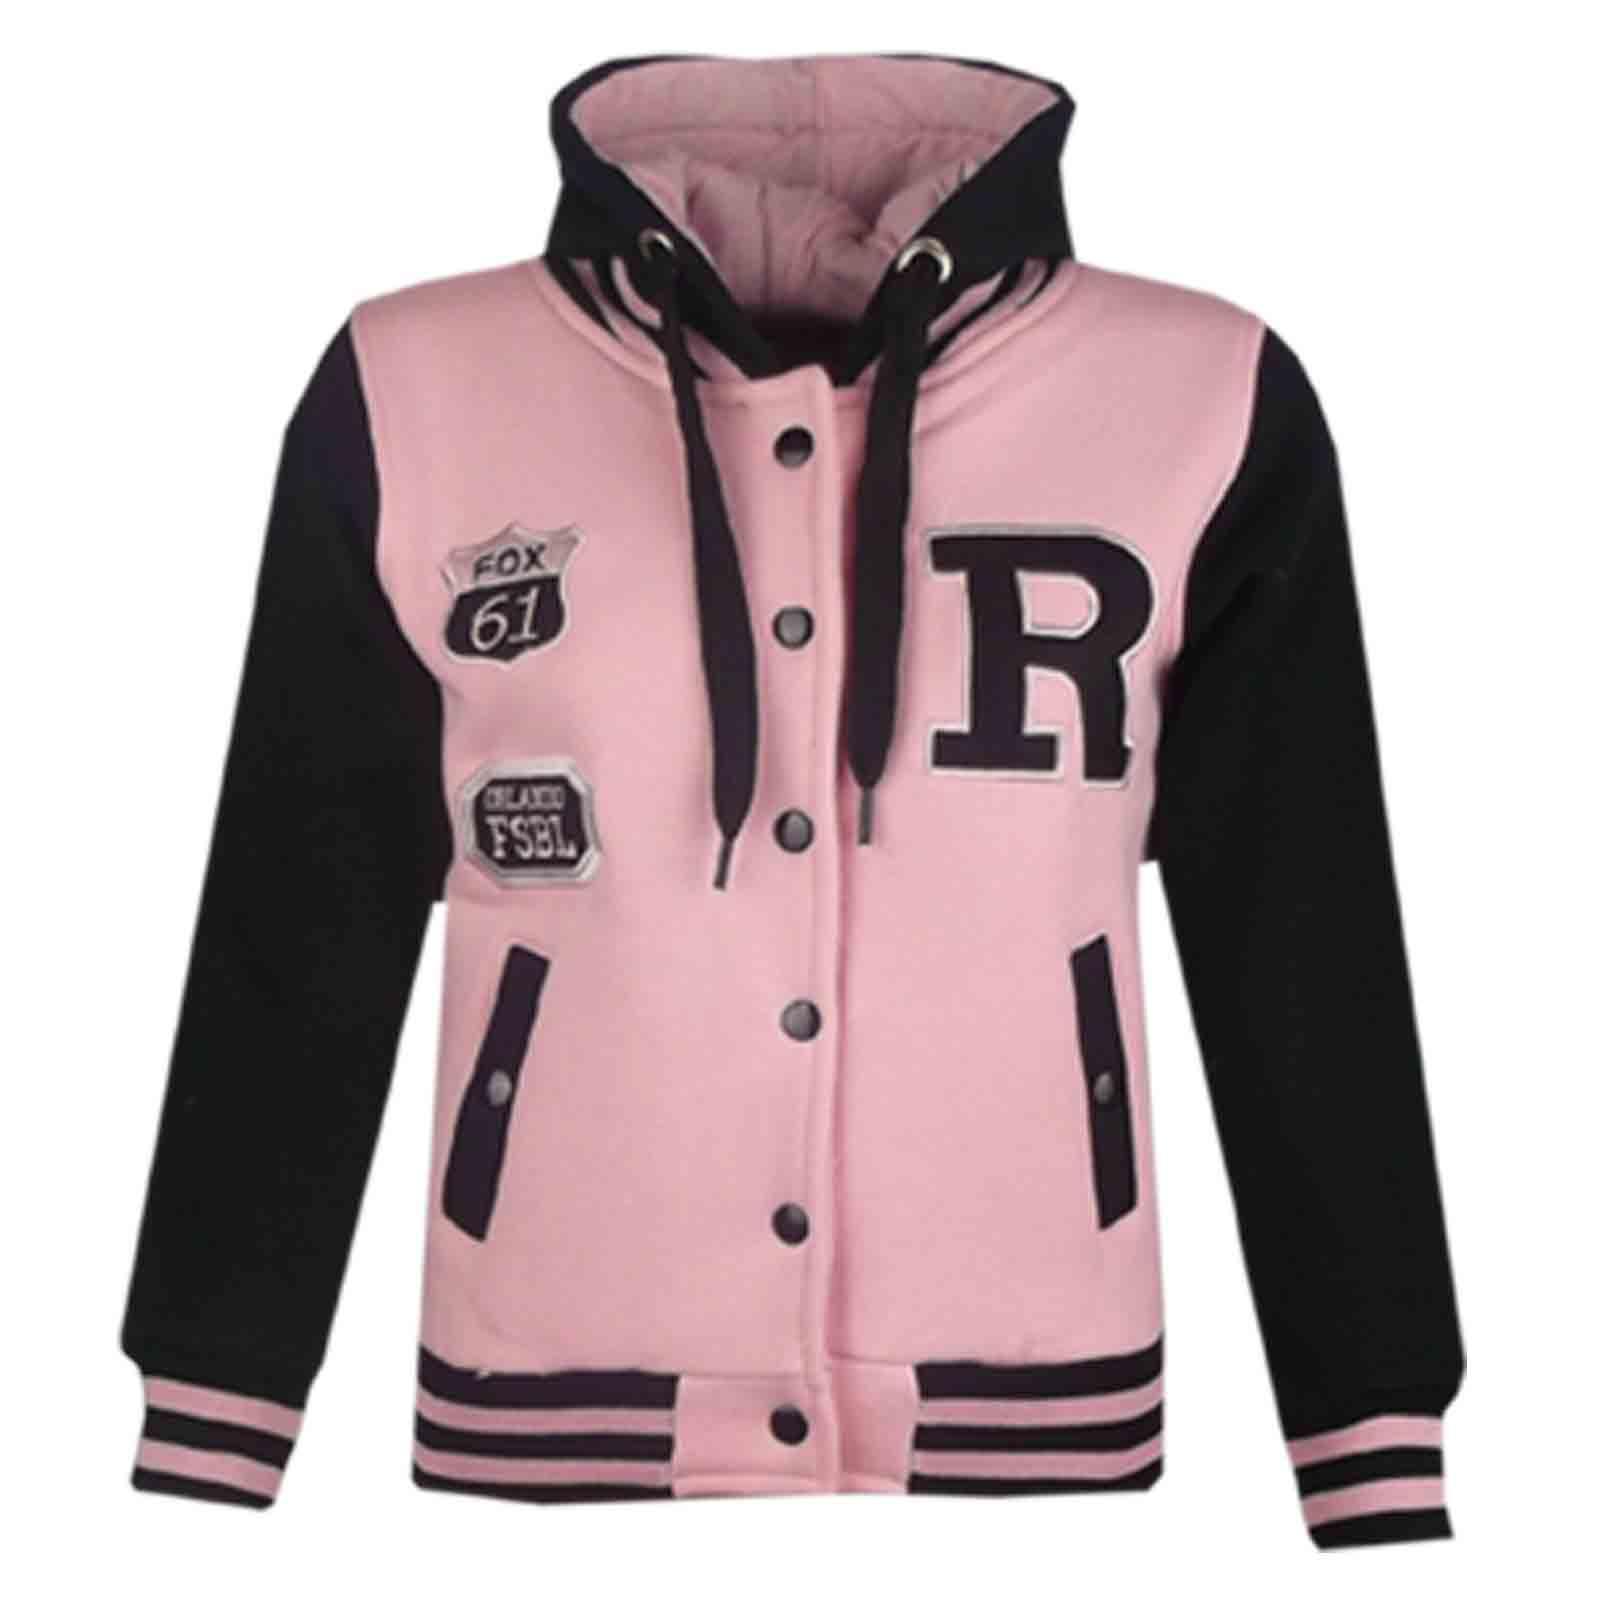 46fd5ec61b07 Kids Girls Boys Baseball R Fashion Hooded Jacket Varsity Hoodie Age ...